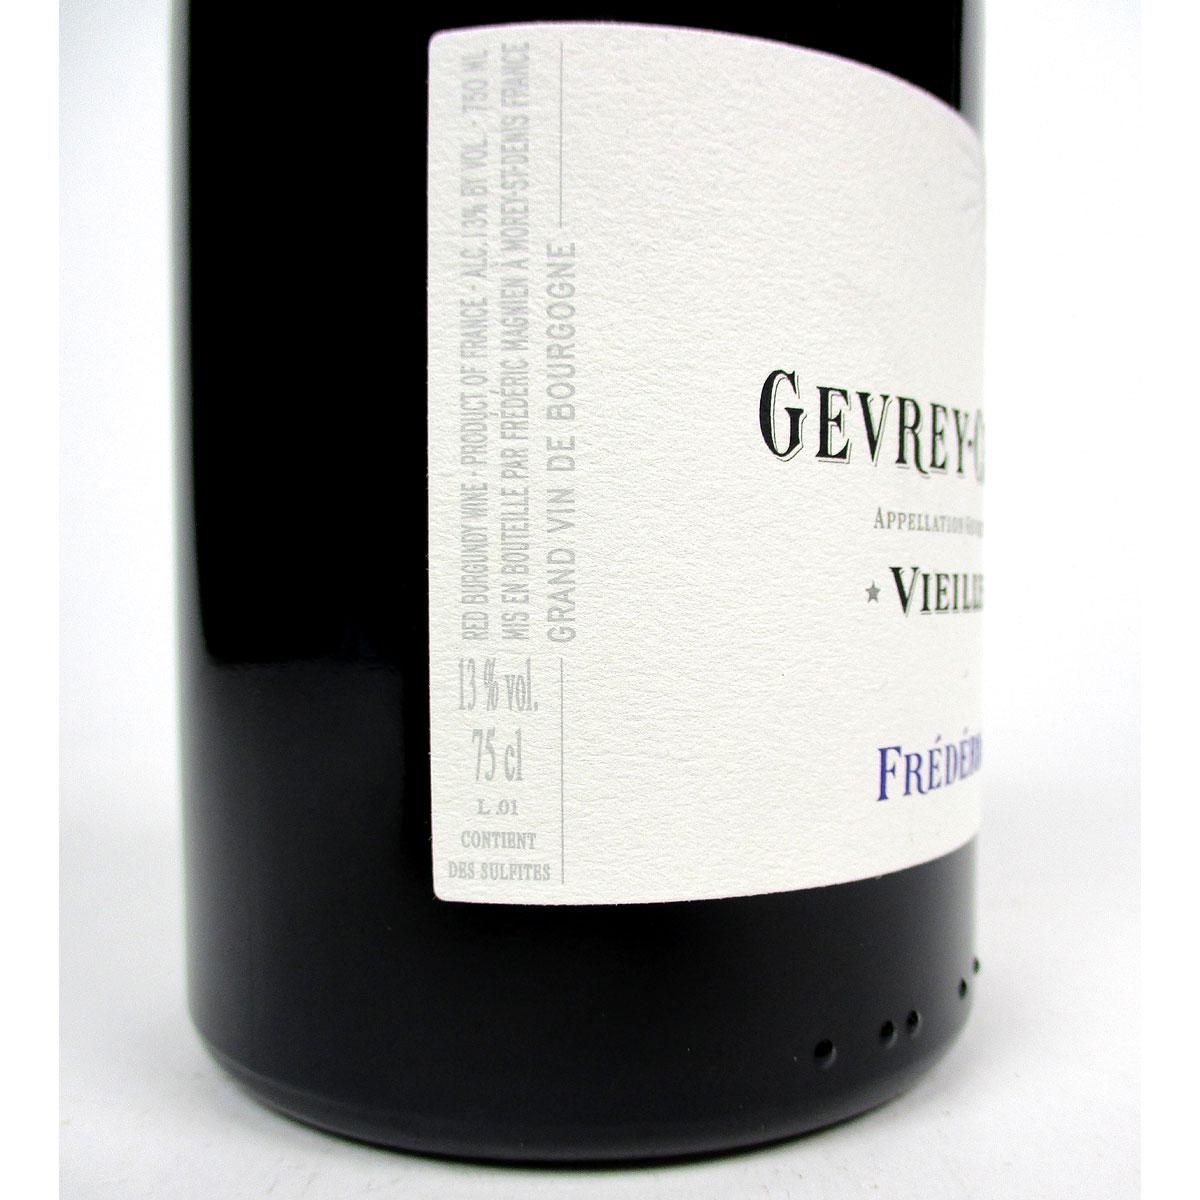 Gevrey-Chambertin: Frédéric Magnien 'Vieilles Vignes' 2017 - Side Label